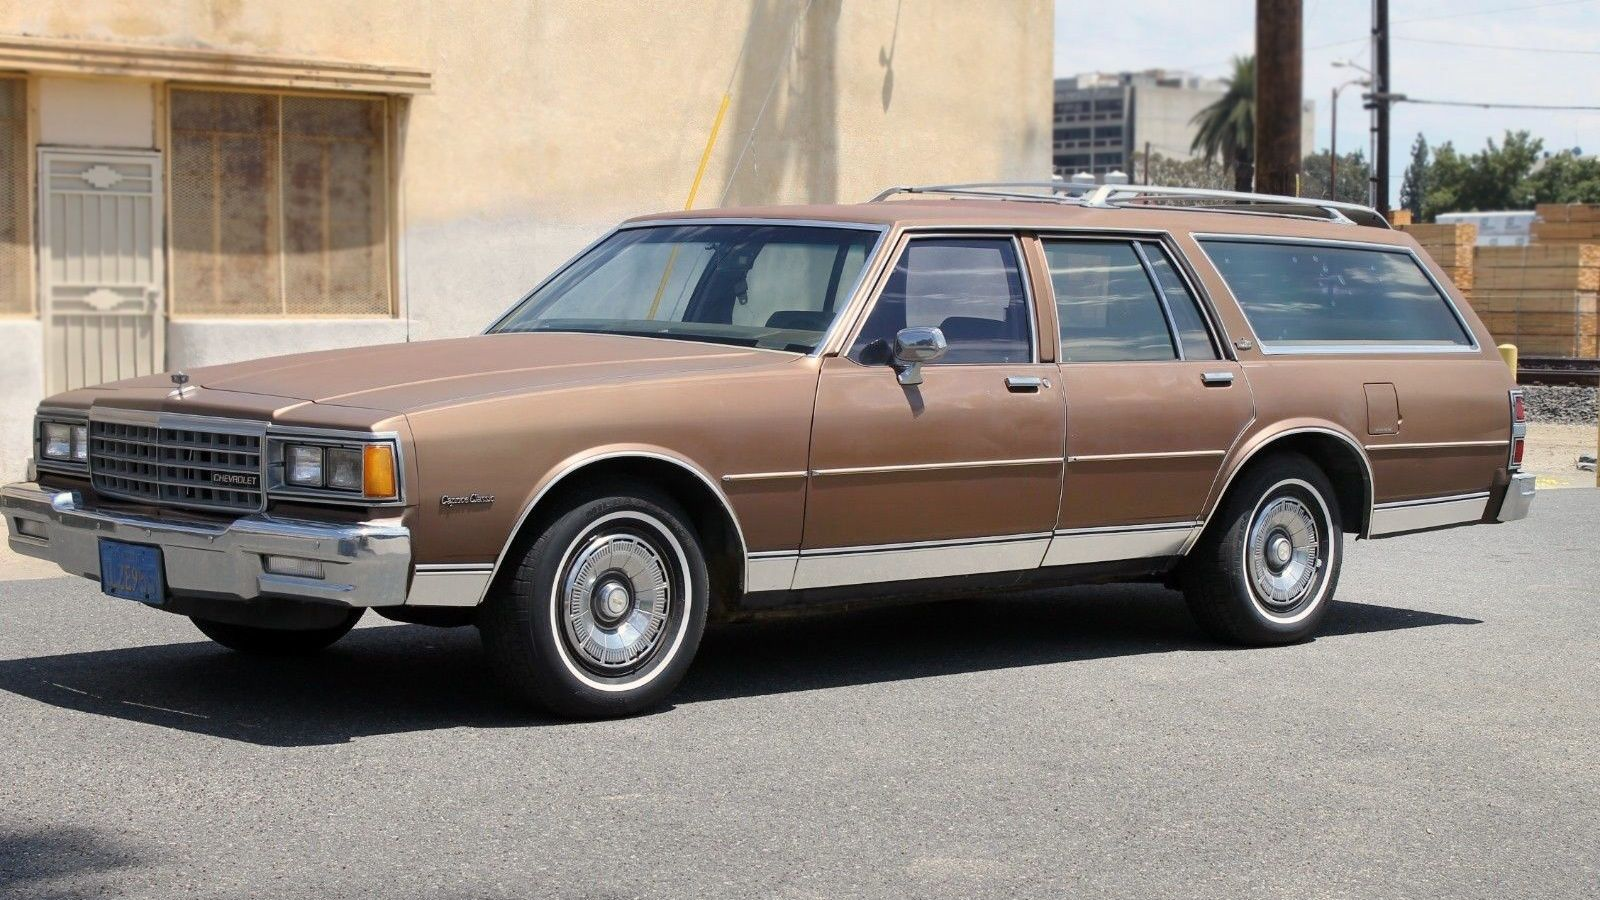 Barn Find 1985 Chevrolet Caprice Wagon Chevrolet Caprice